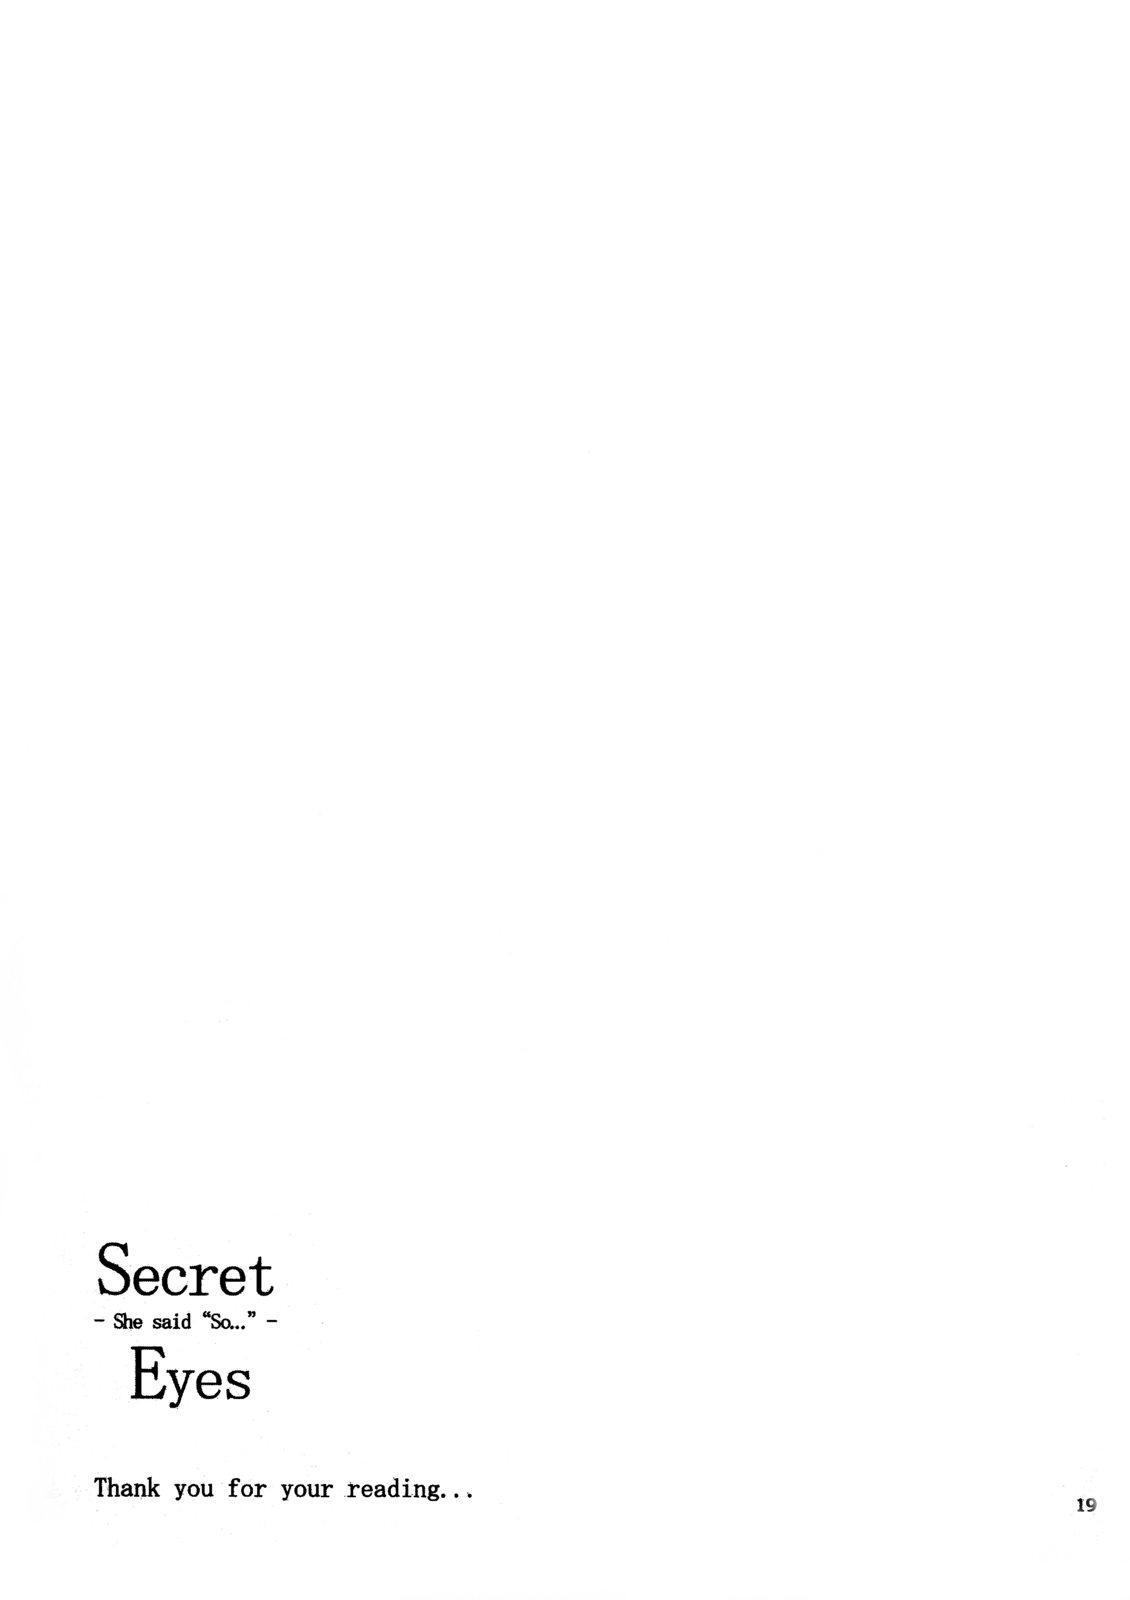 Secret Eyes - She said ''So...'' 17